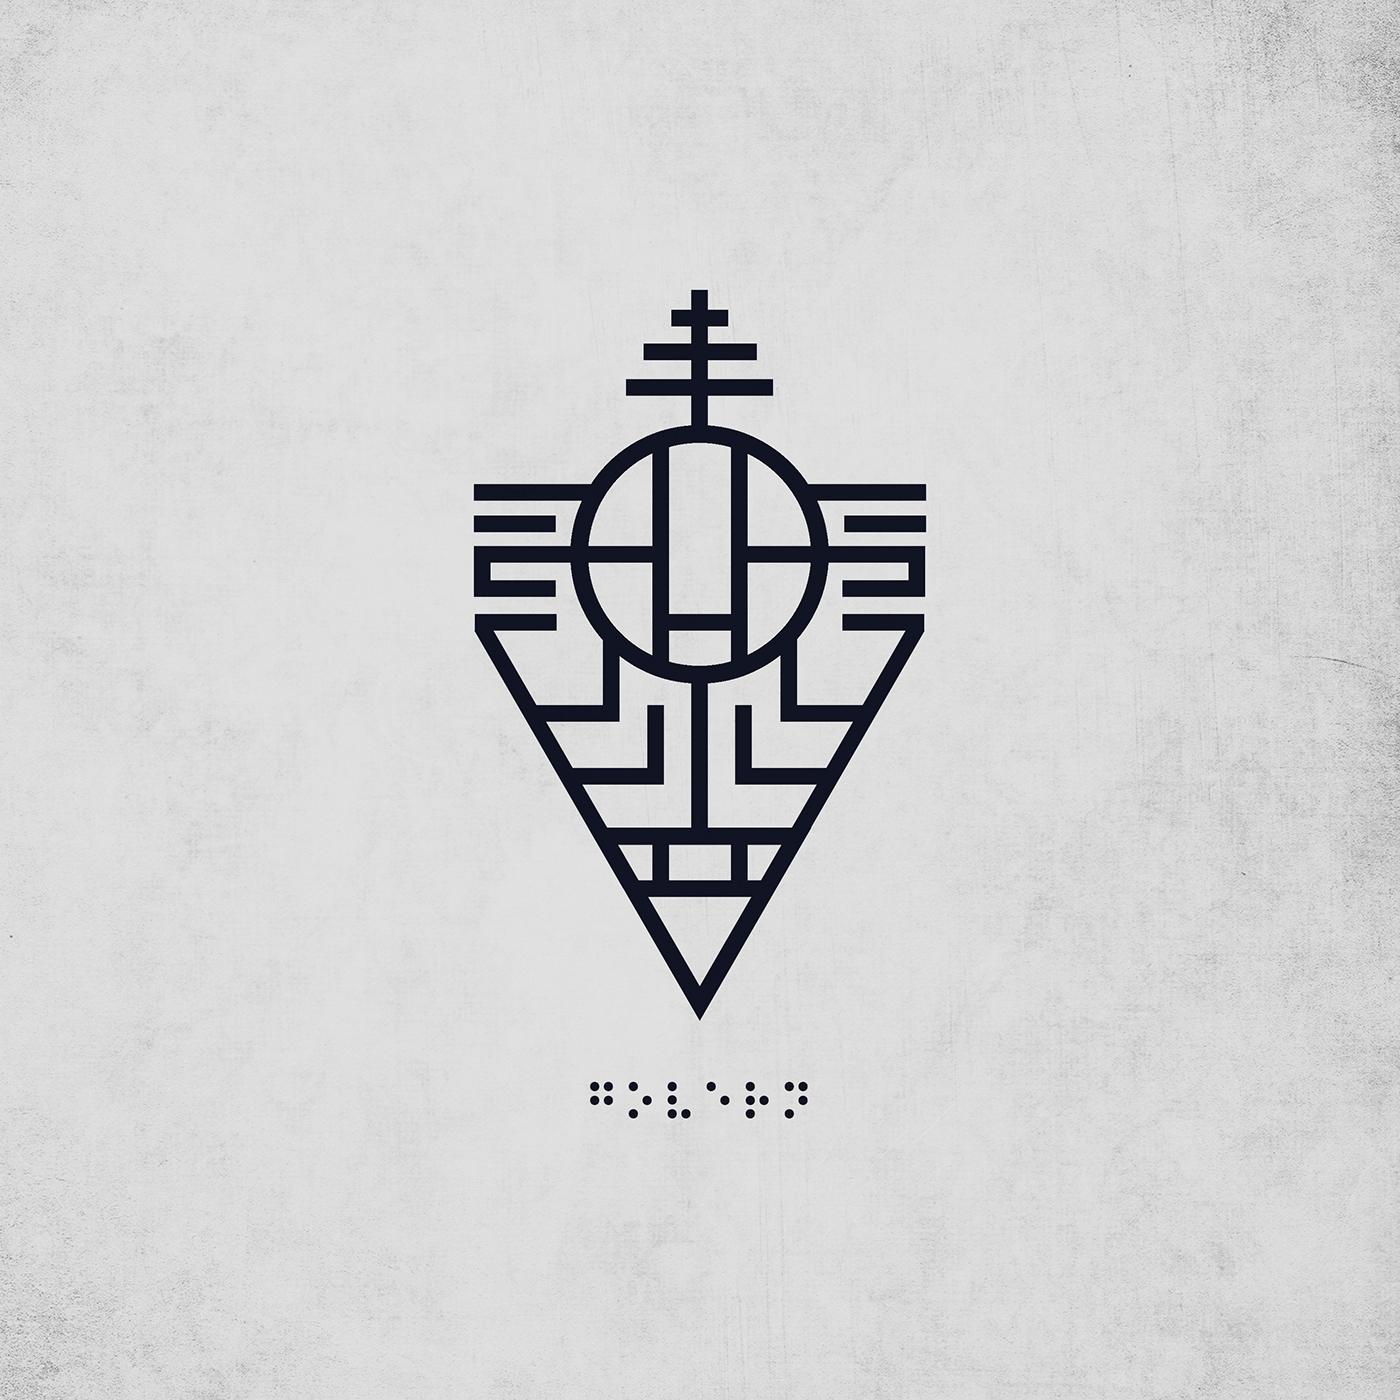 simetria-08